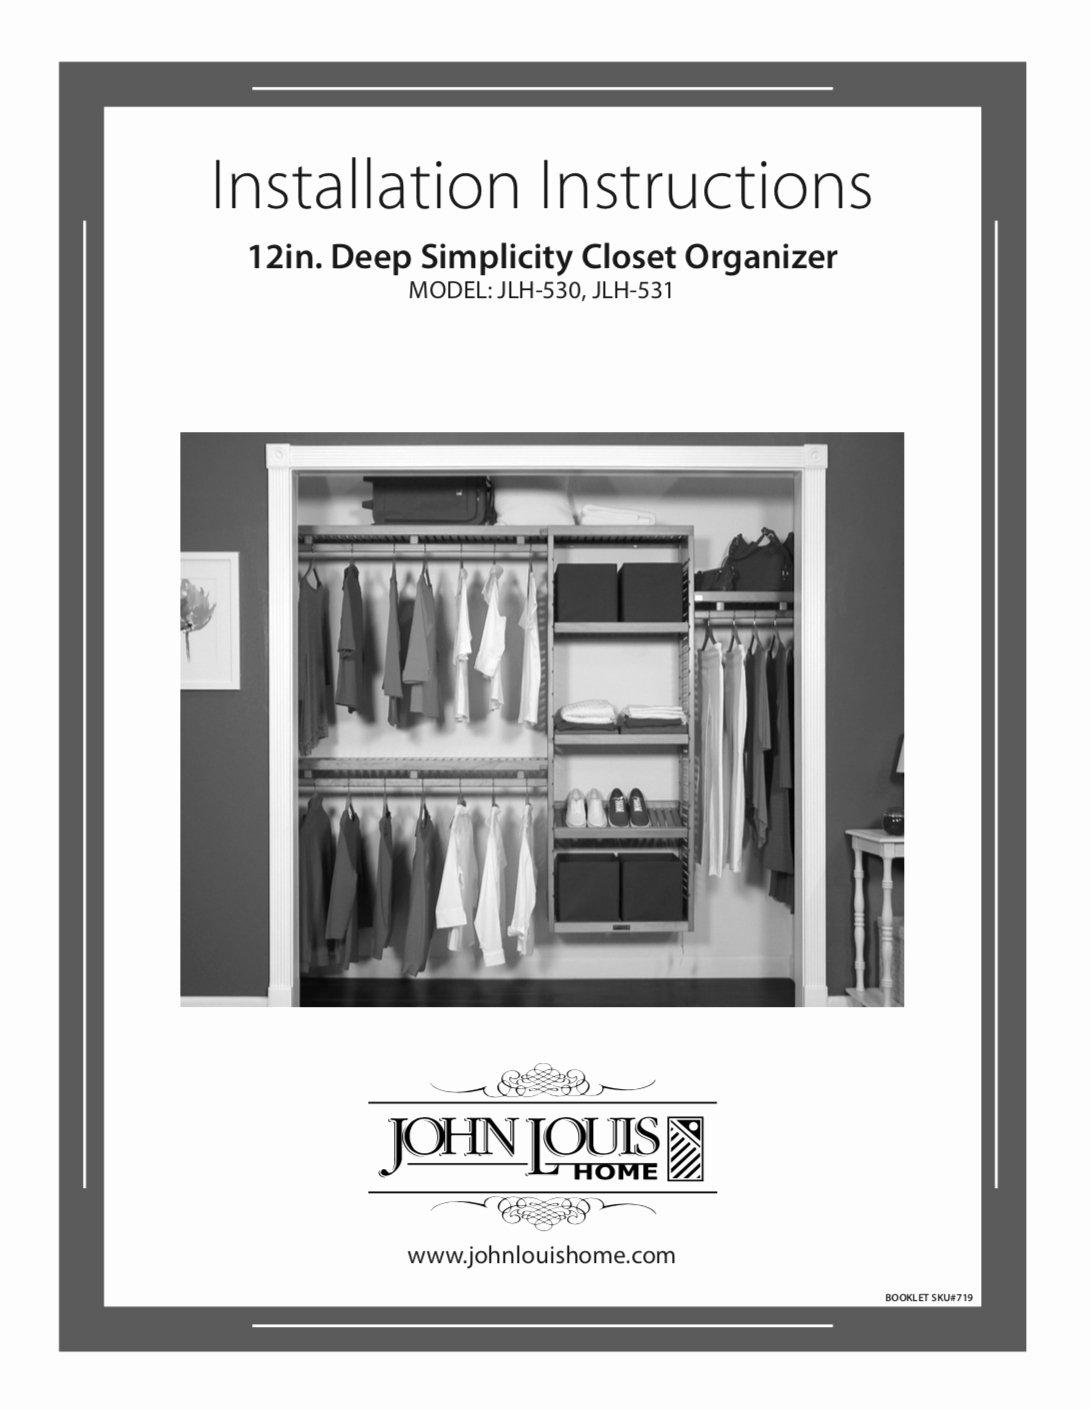 Wiring Instructions Template Unique Simplicity Wood Closet organizer L John Louis Home